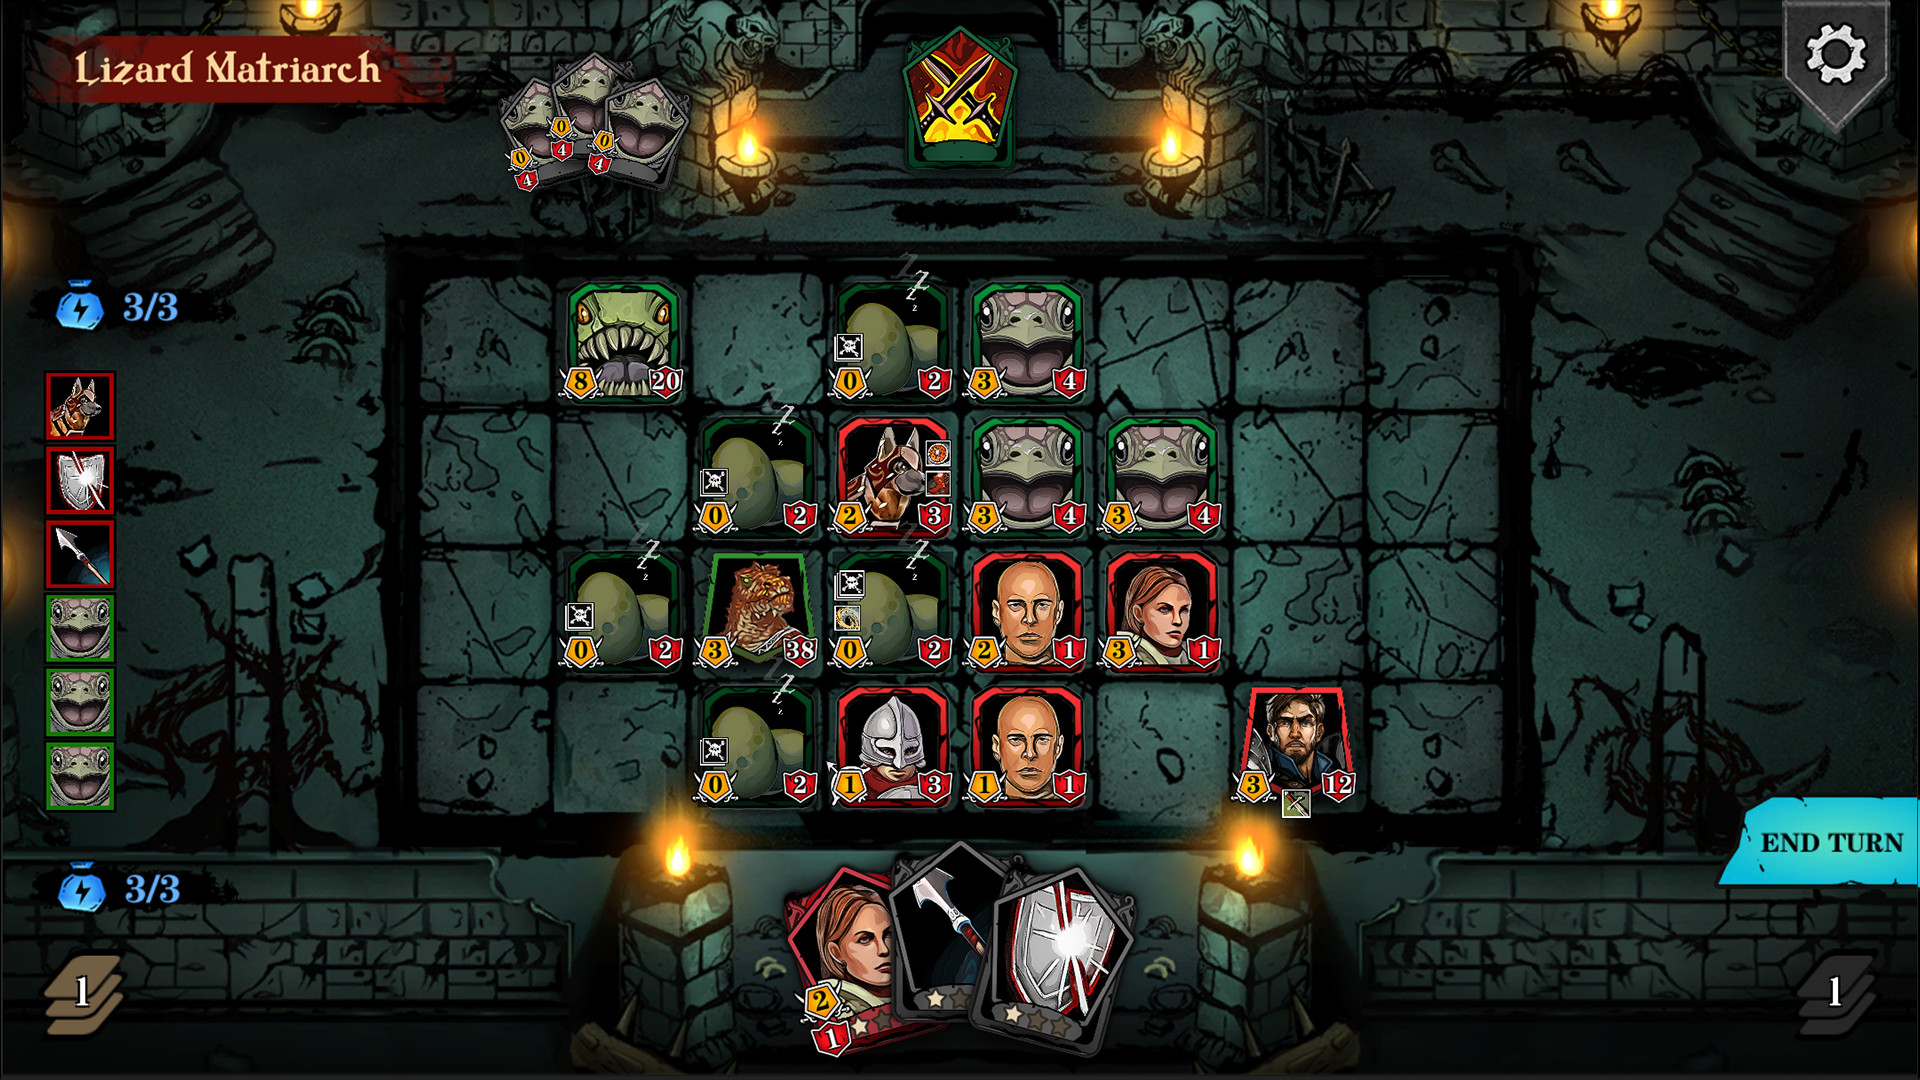 DungeonTop Board